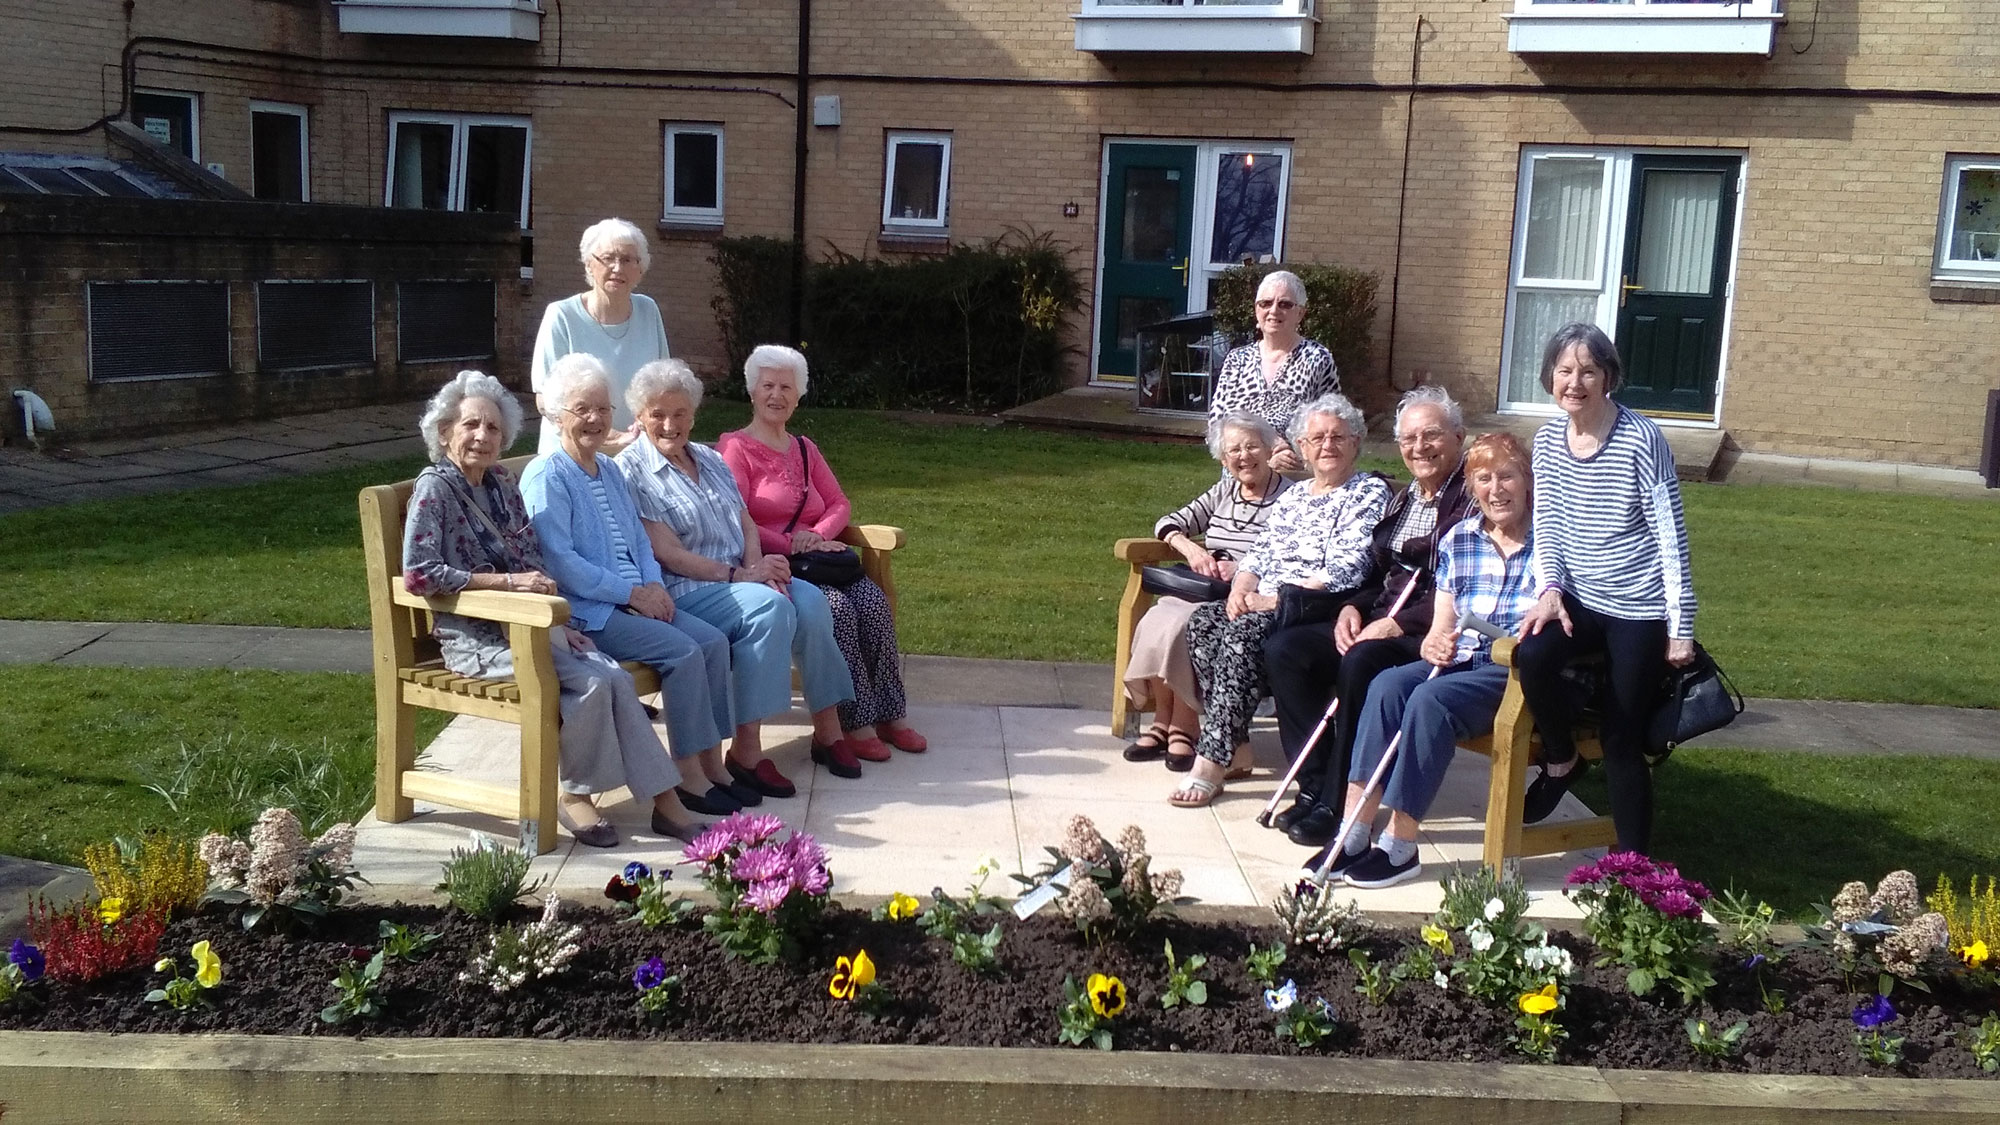 Bingley Residents Welcome New Communal Garden News